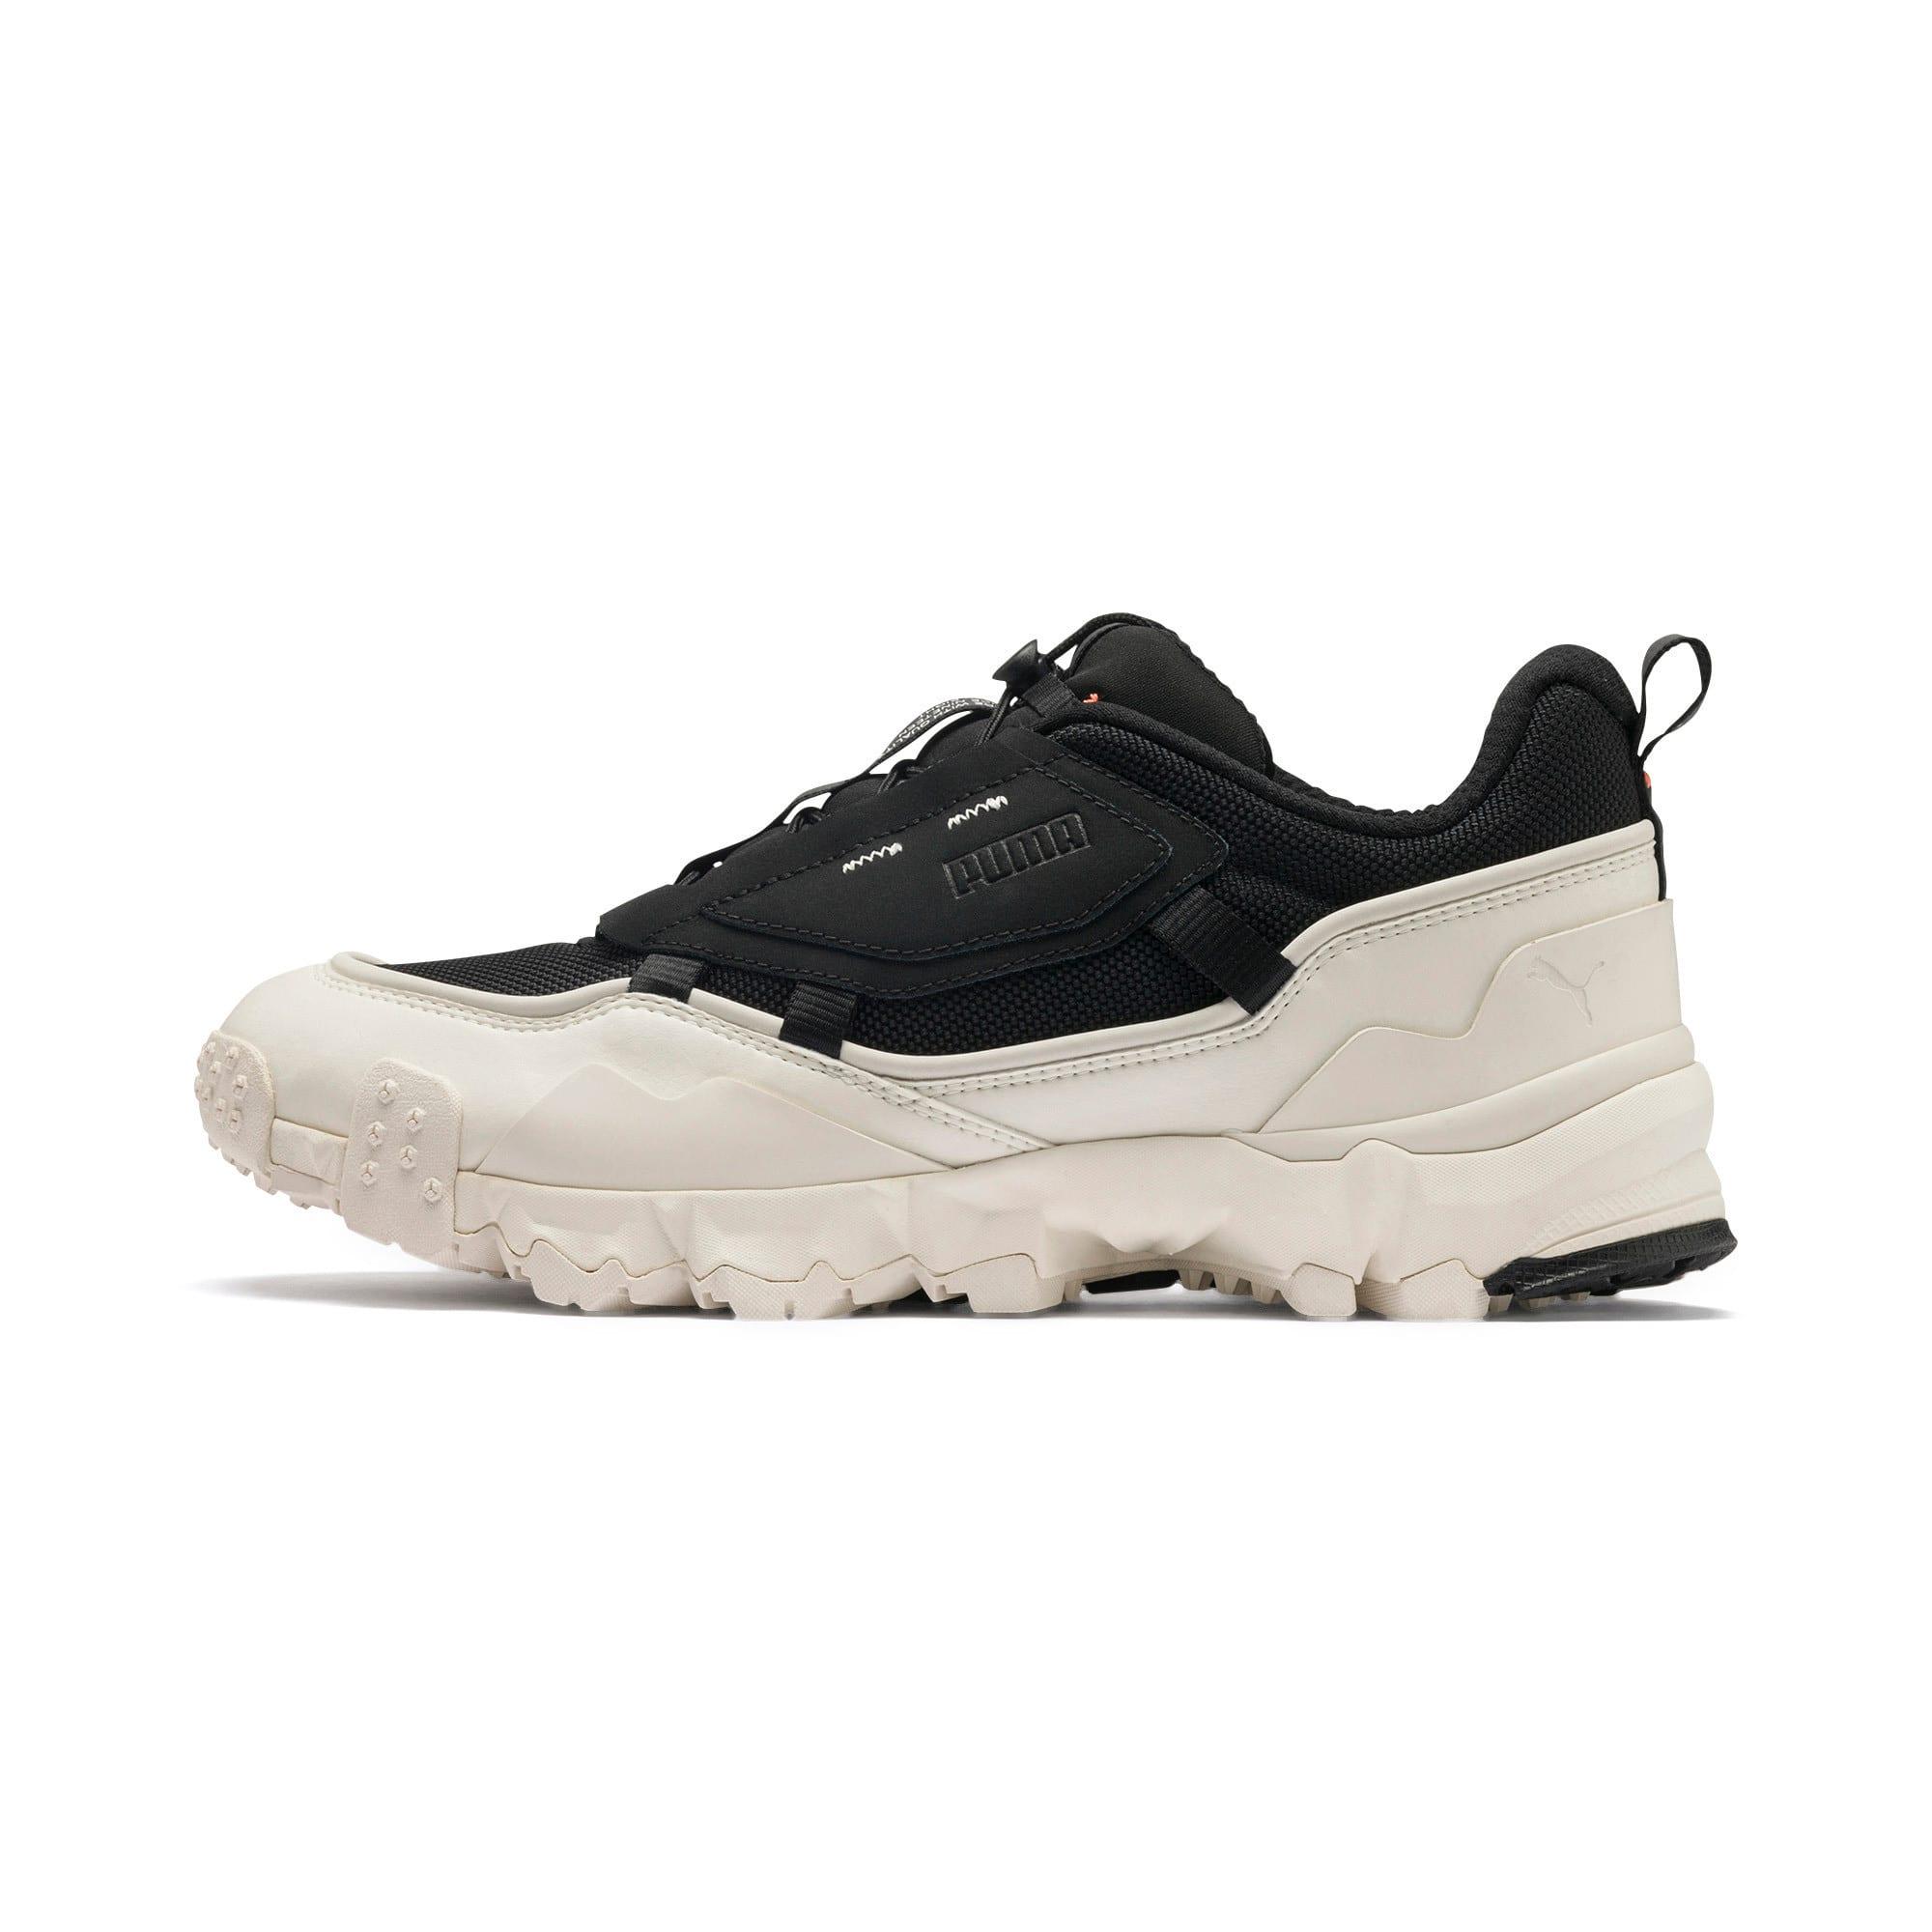 Thumbnail 1 of Trailfox Overland Sneakers, Puma Black-Whisper White, medium